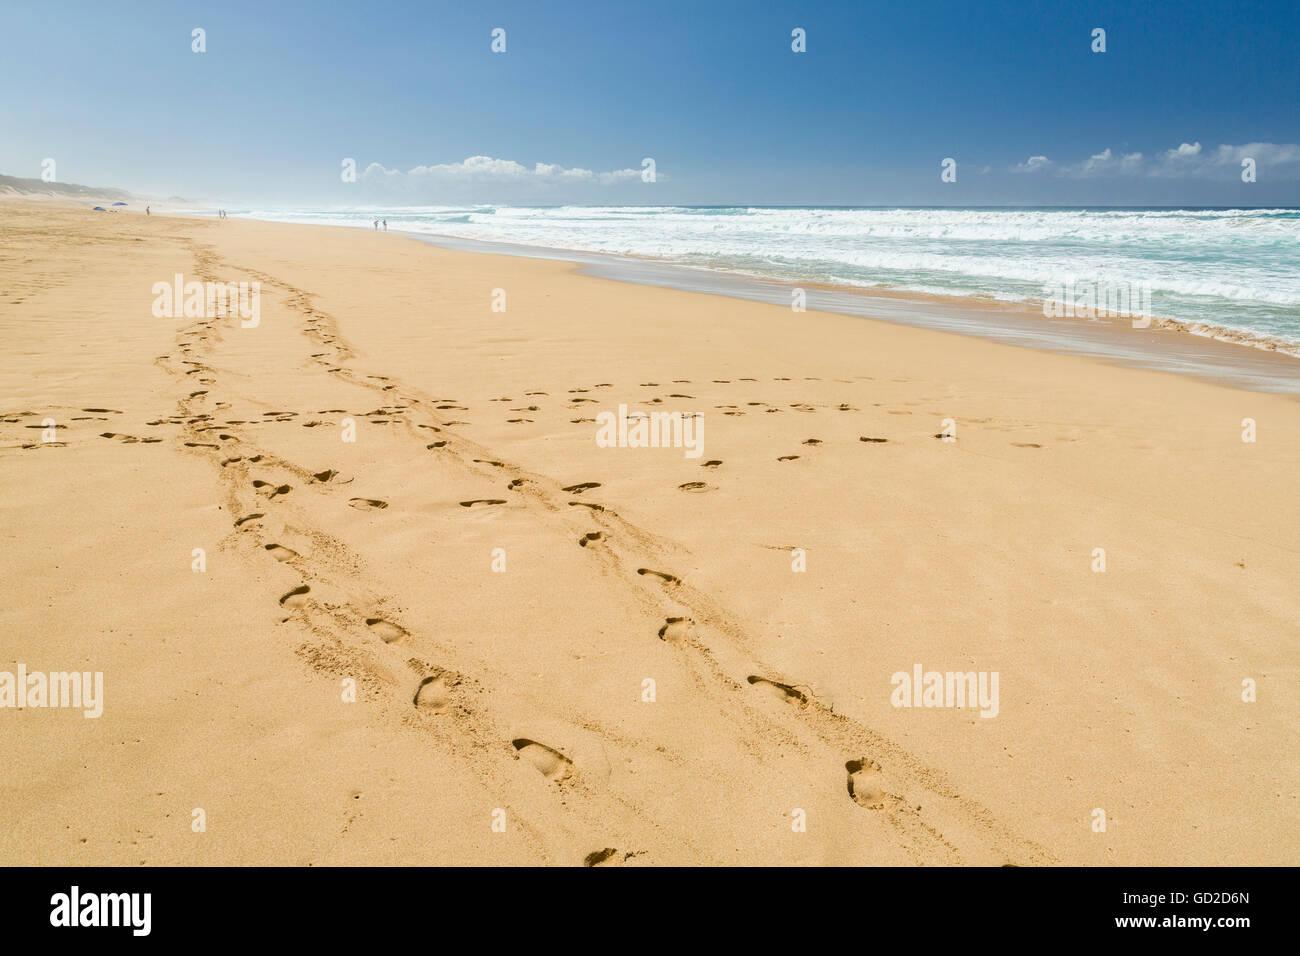 Footprints in the sand, Barking Sands (Polihale Beach) on West Kauai; Kauai, Hawaii, United States of America Stock Photo